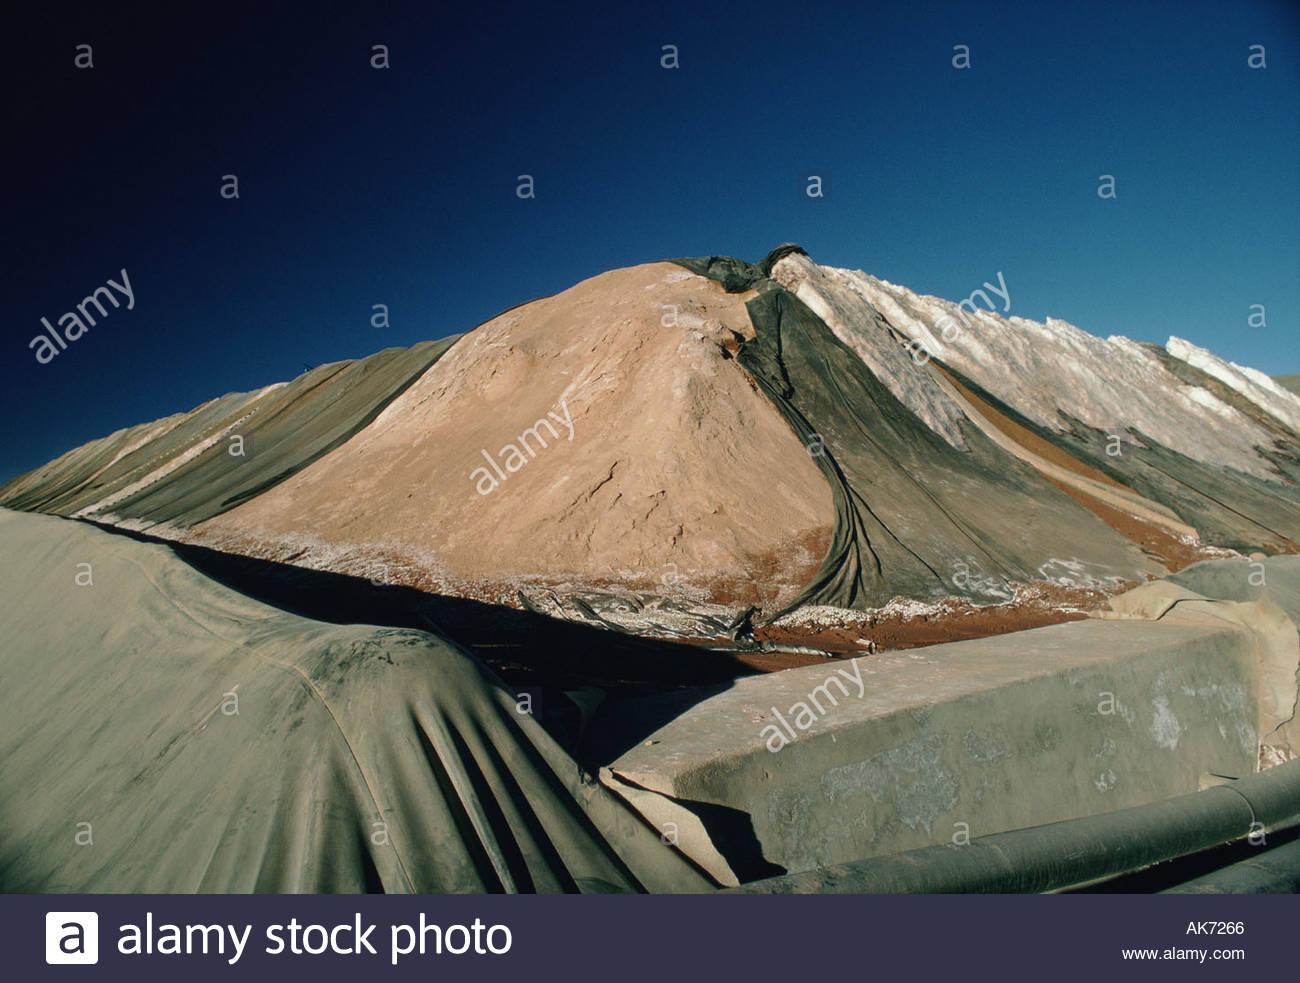 BOLIVIA Andes 14000 feet high silver slag heap next to Potosi city - Stock Image